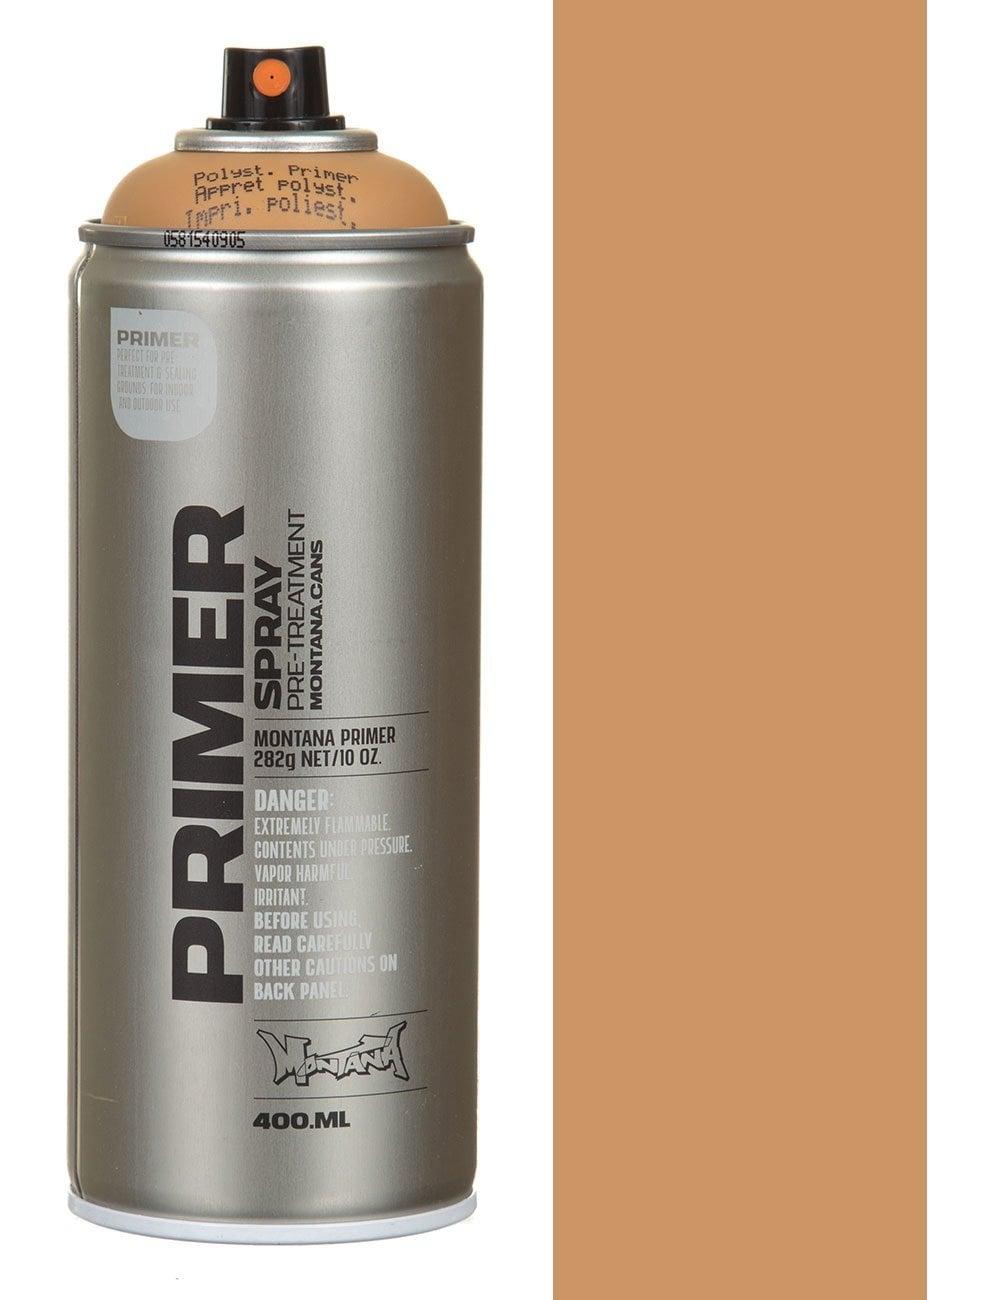 Montana Gold Styrofoam Primer Spray Paint 400ml Spray